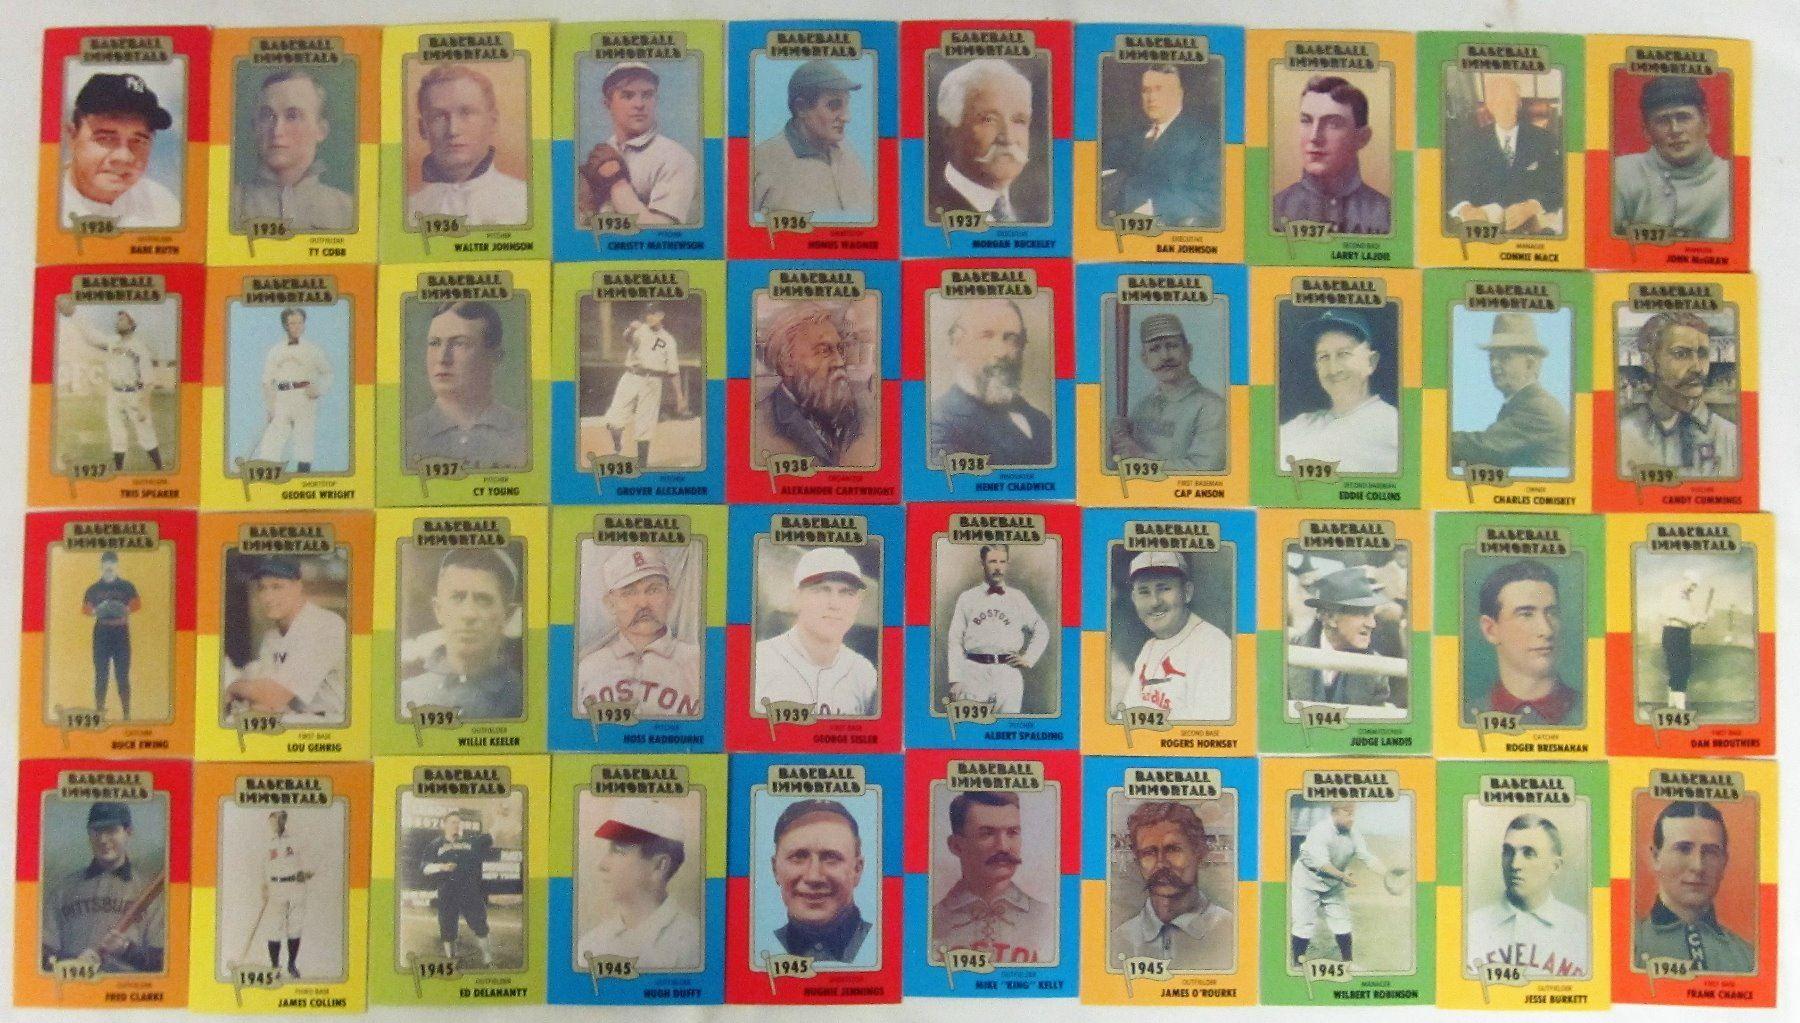 Set 160 Baseball Immortals Cards